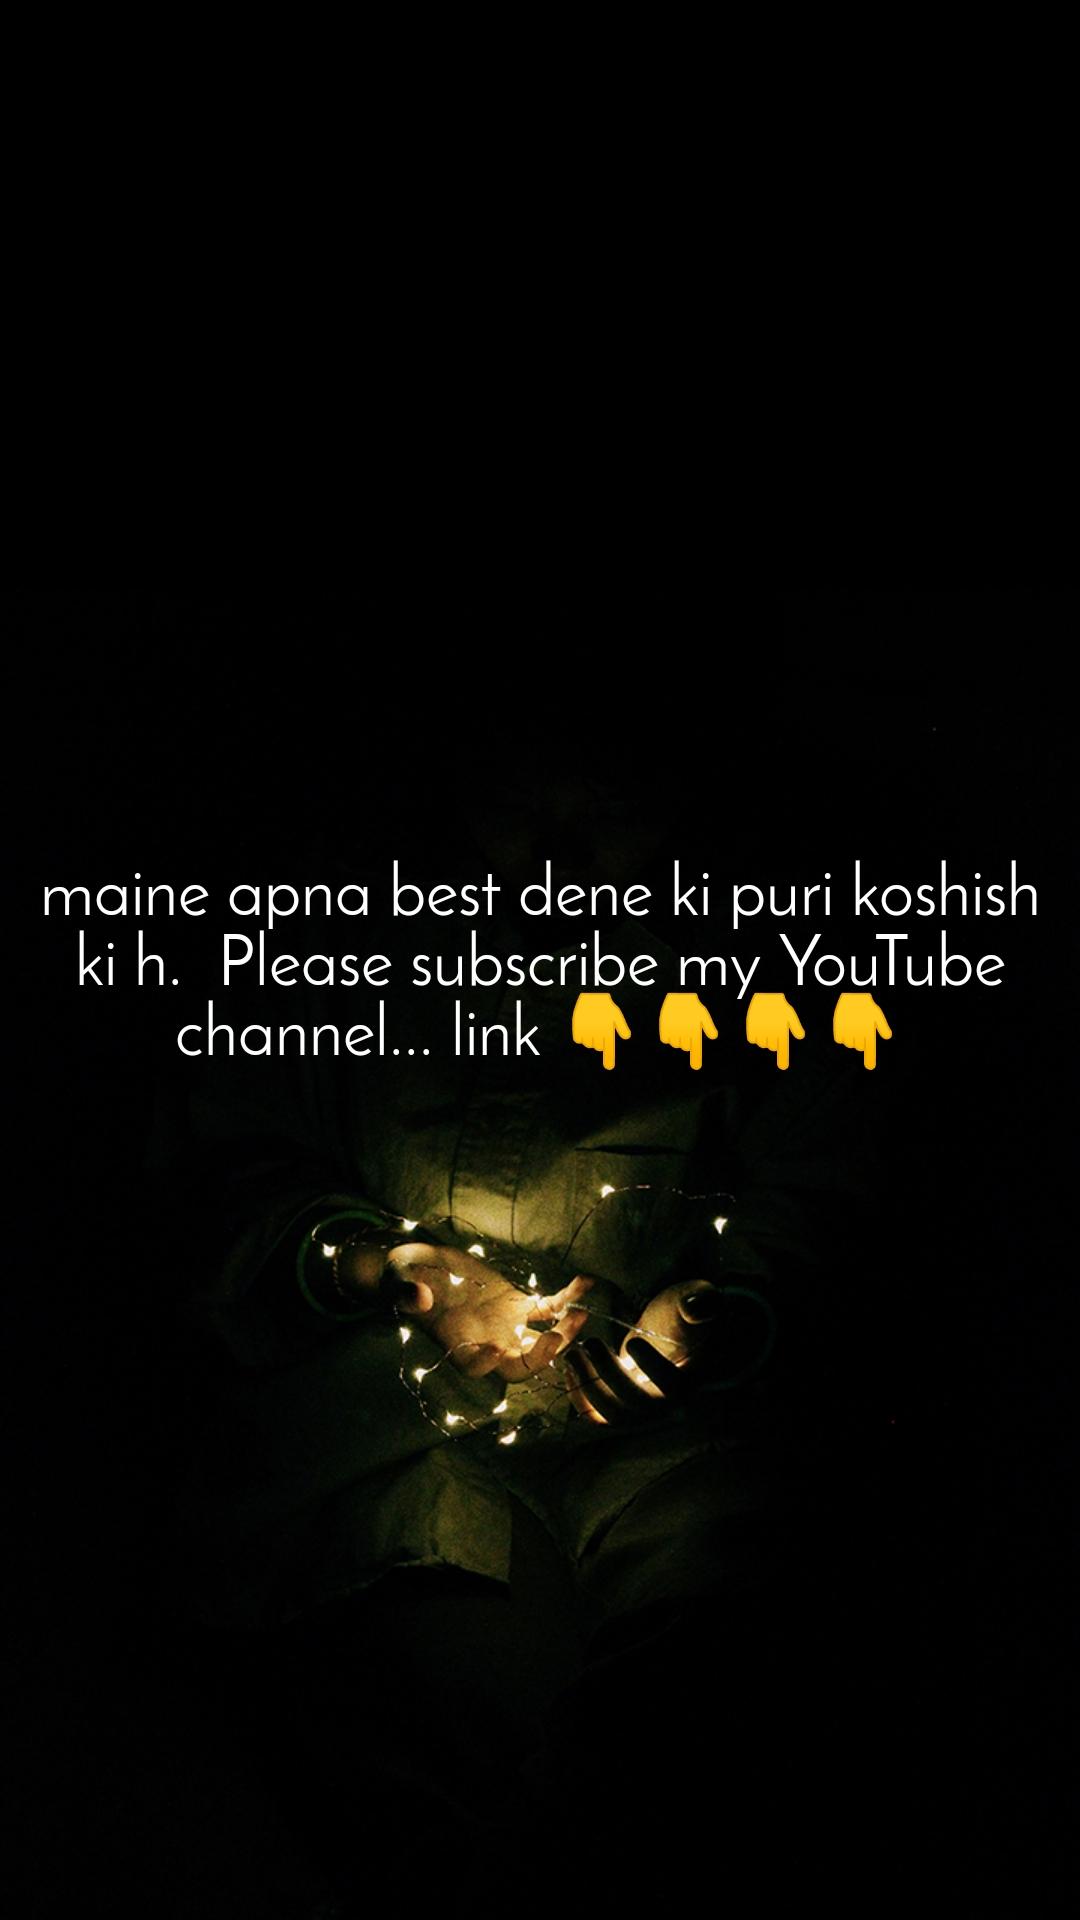 maine apna best dene ki puri koshish ki h.  Please subscribe my YouTube channel... link 👇👇👇👇